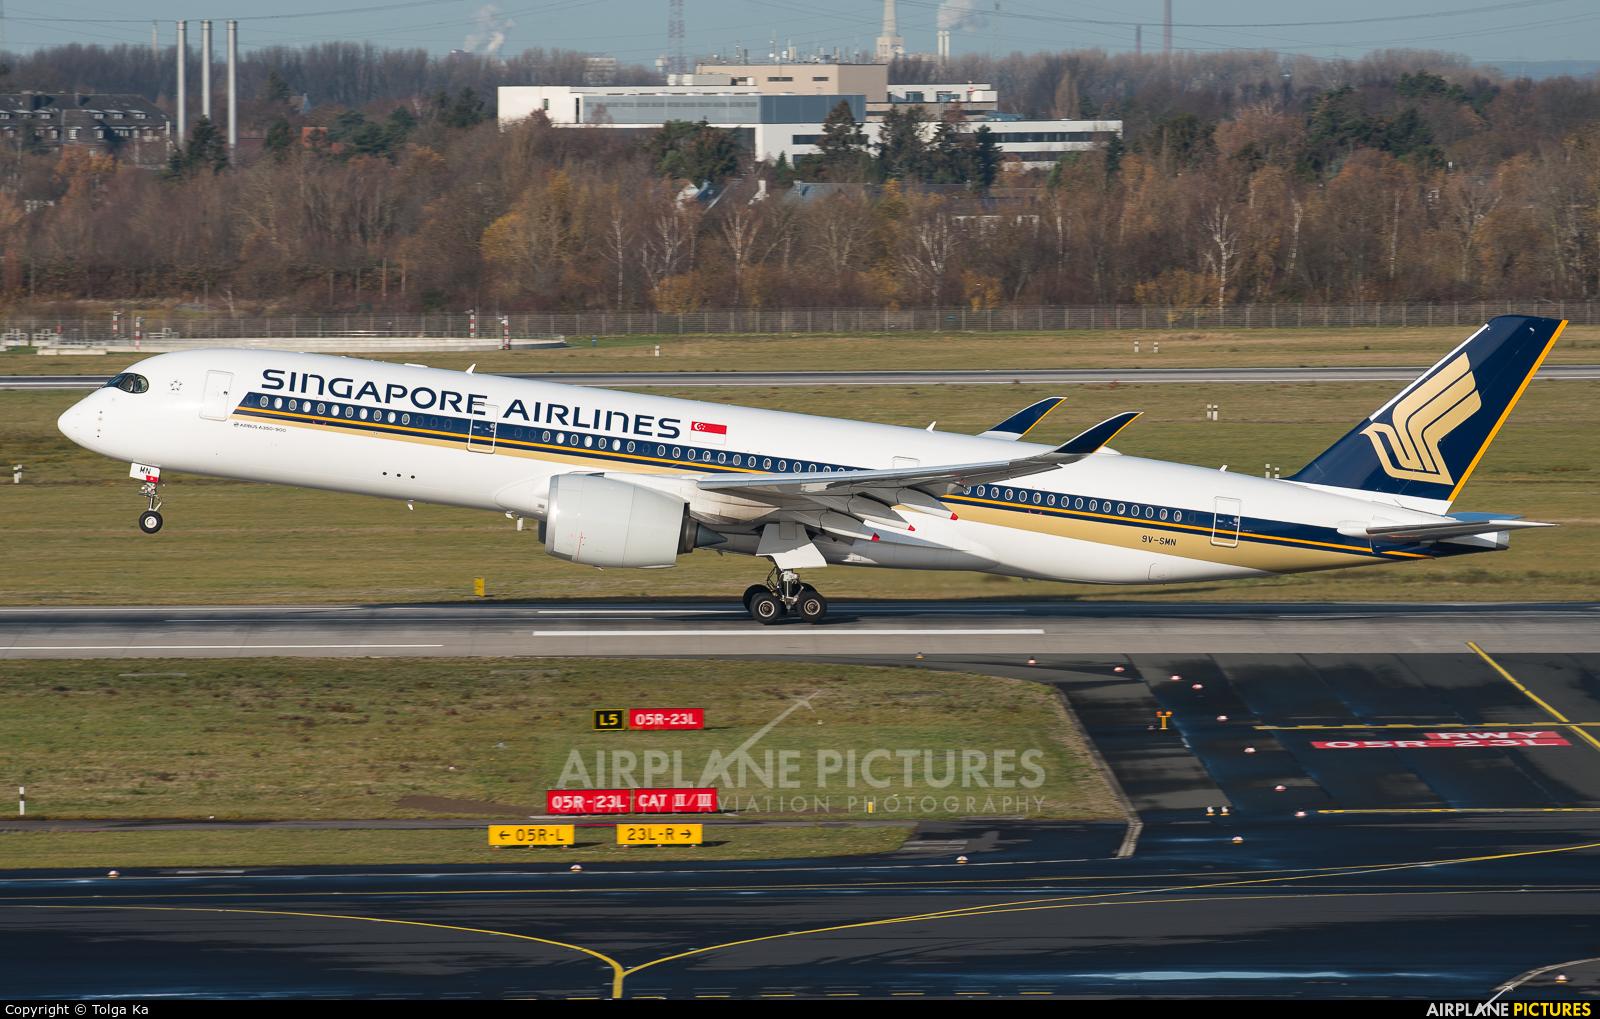 Singapore Airlines 9V-SMN aircraft at Düsseldorf